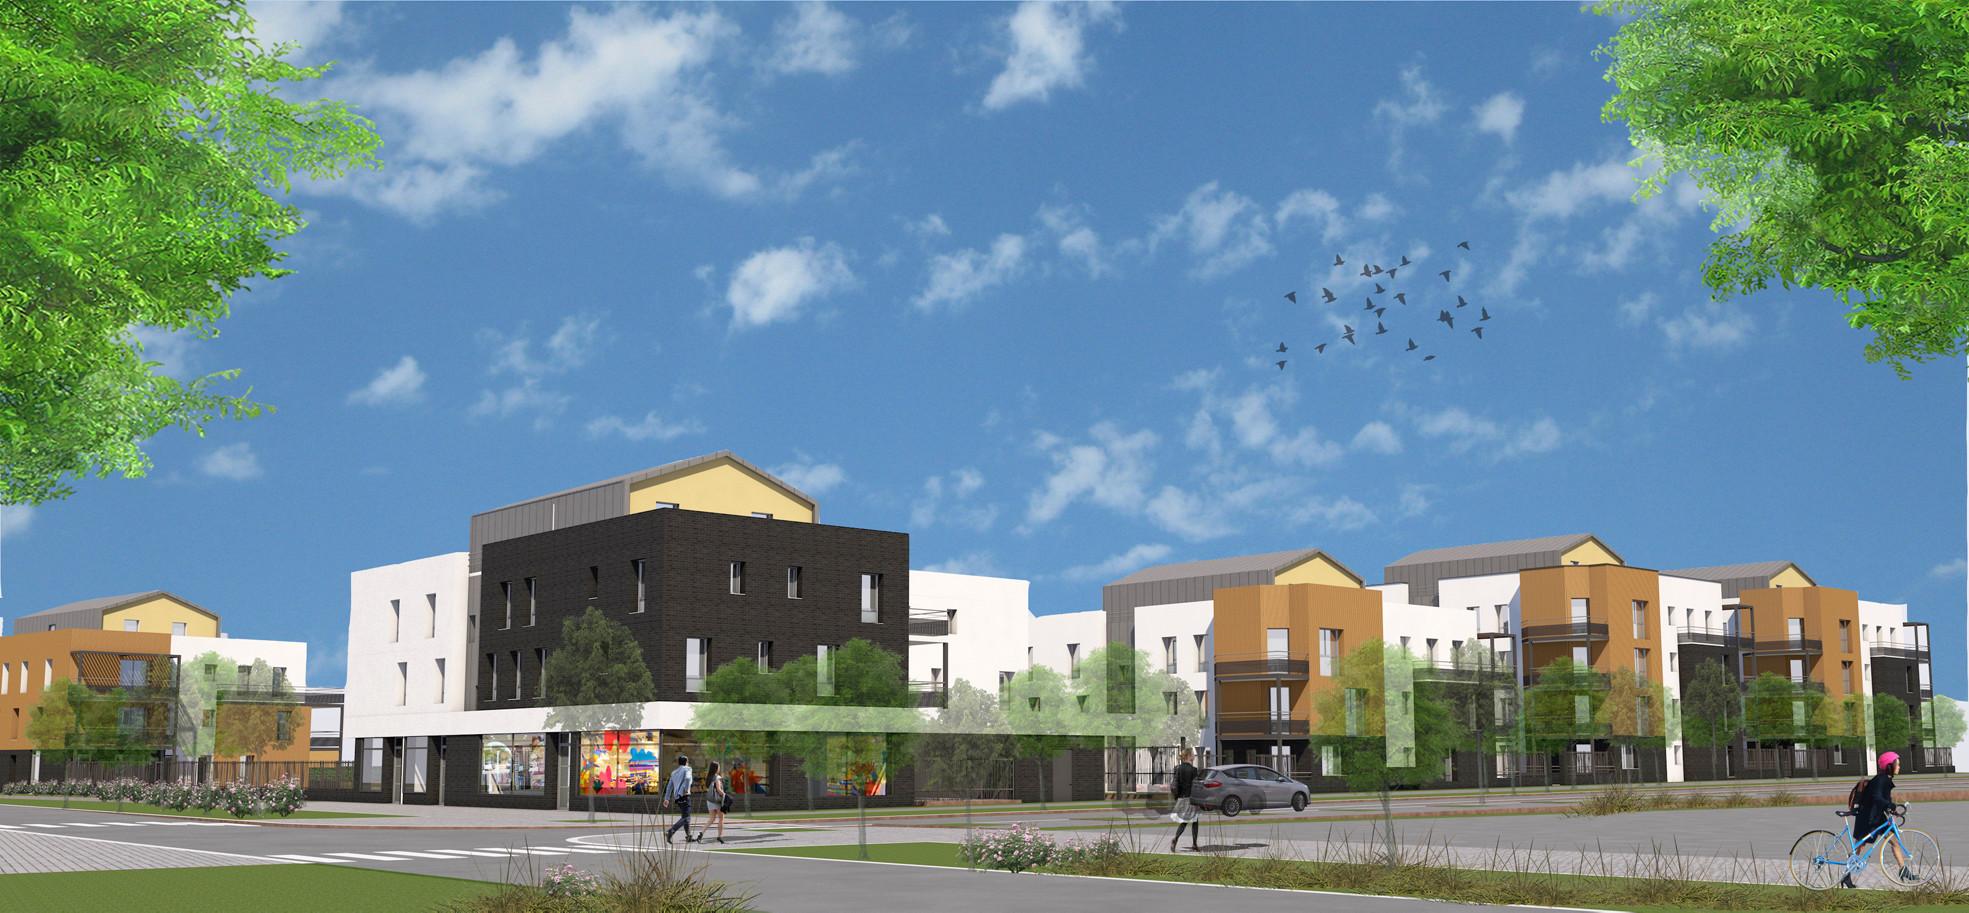 77 600 Bussy-Saint-Georges I Emmaüs Habitat, 1er permis de construire BIM en France